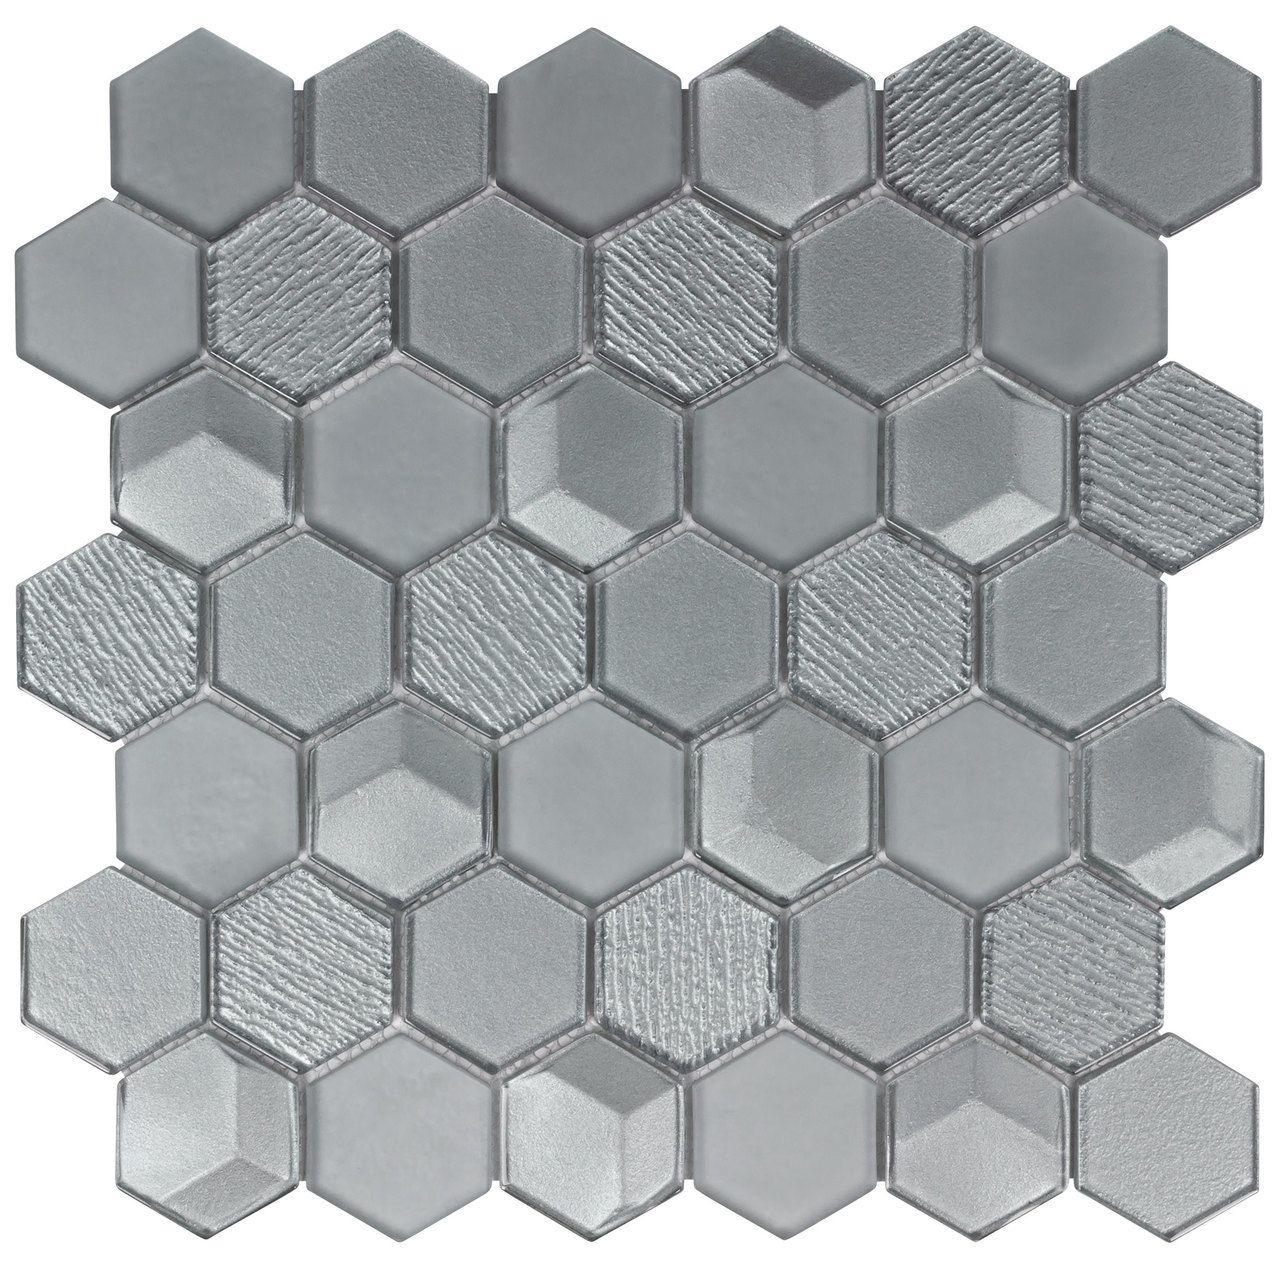 Glass Mosaic Tile Hexagon Gray | Mineral Tiles